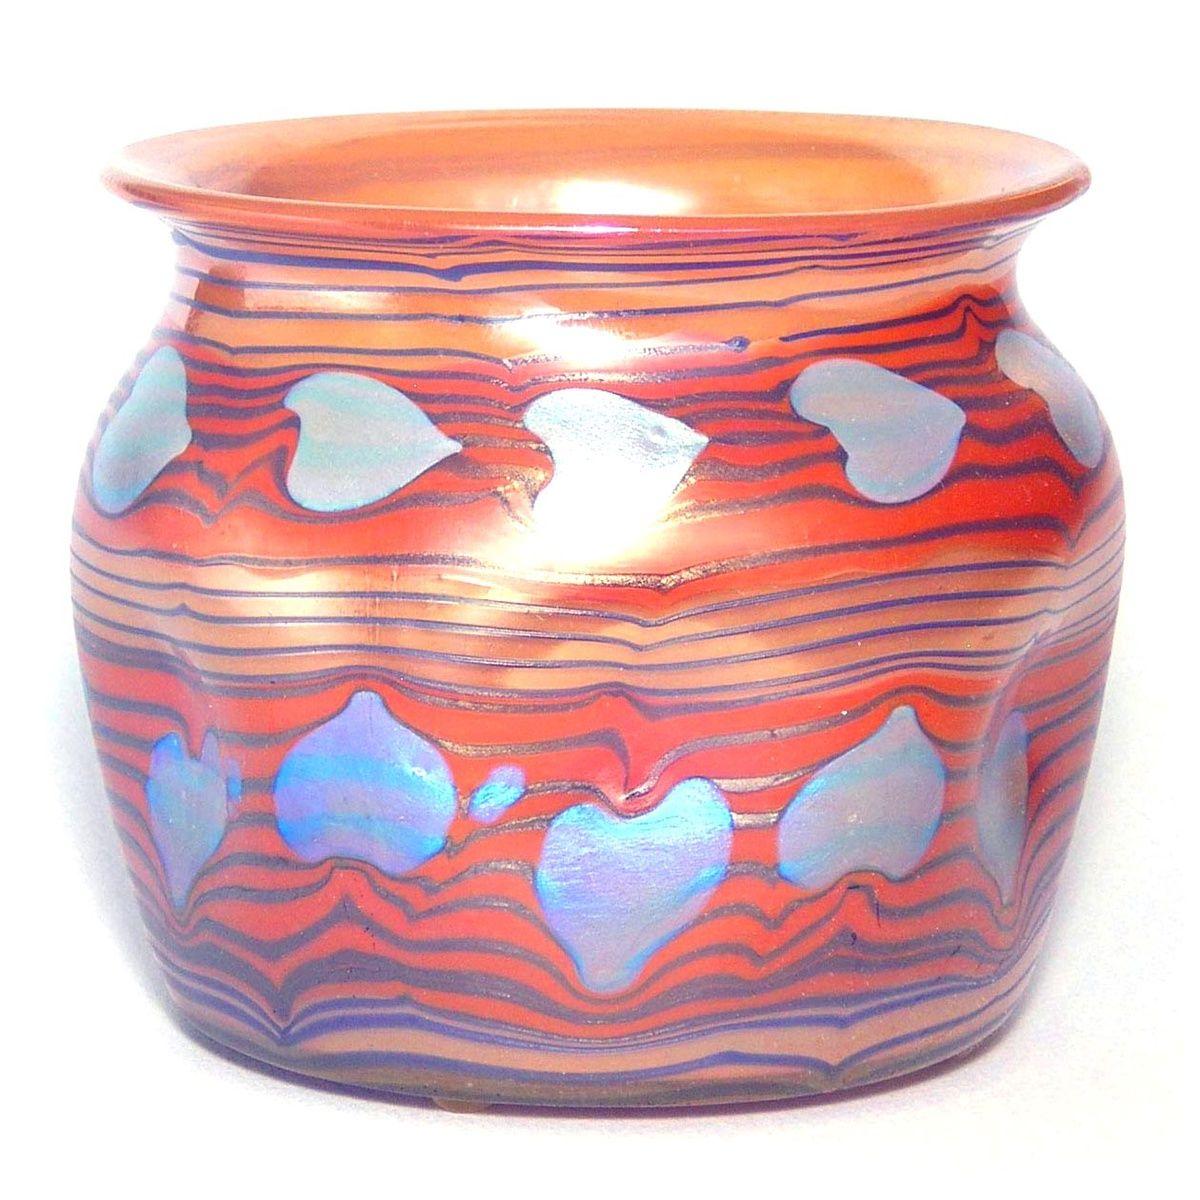 ** Johann Lötz Witwe, Klostermühle, Iridescent Glass Vase.